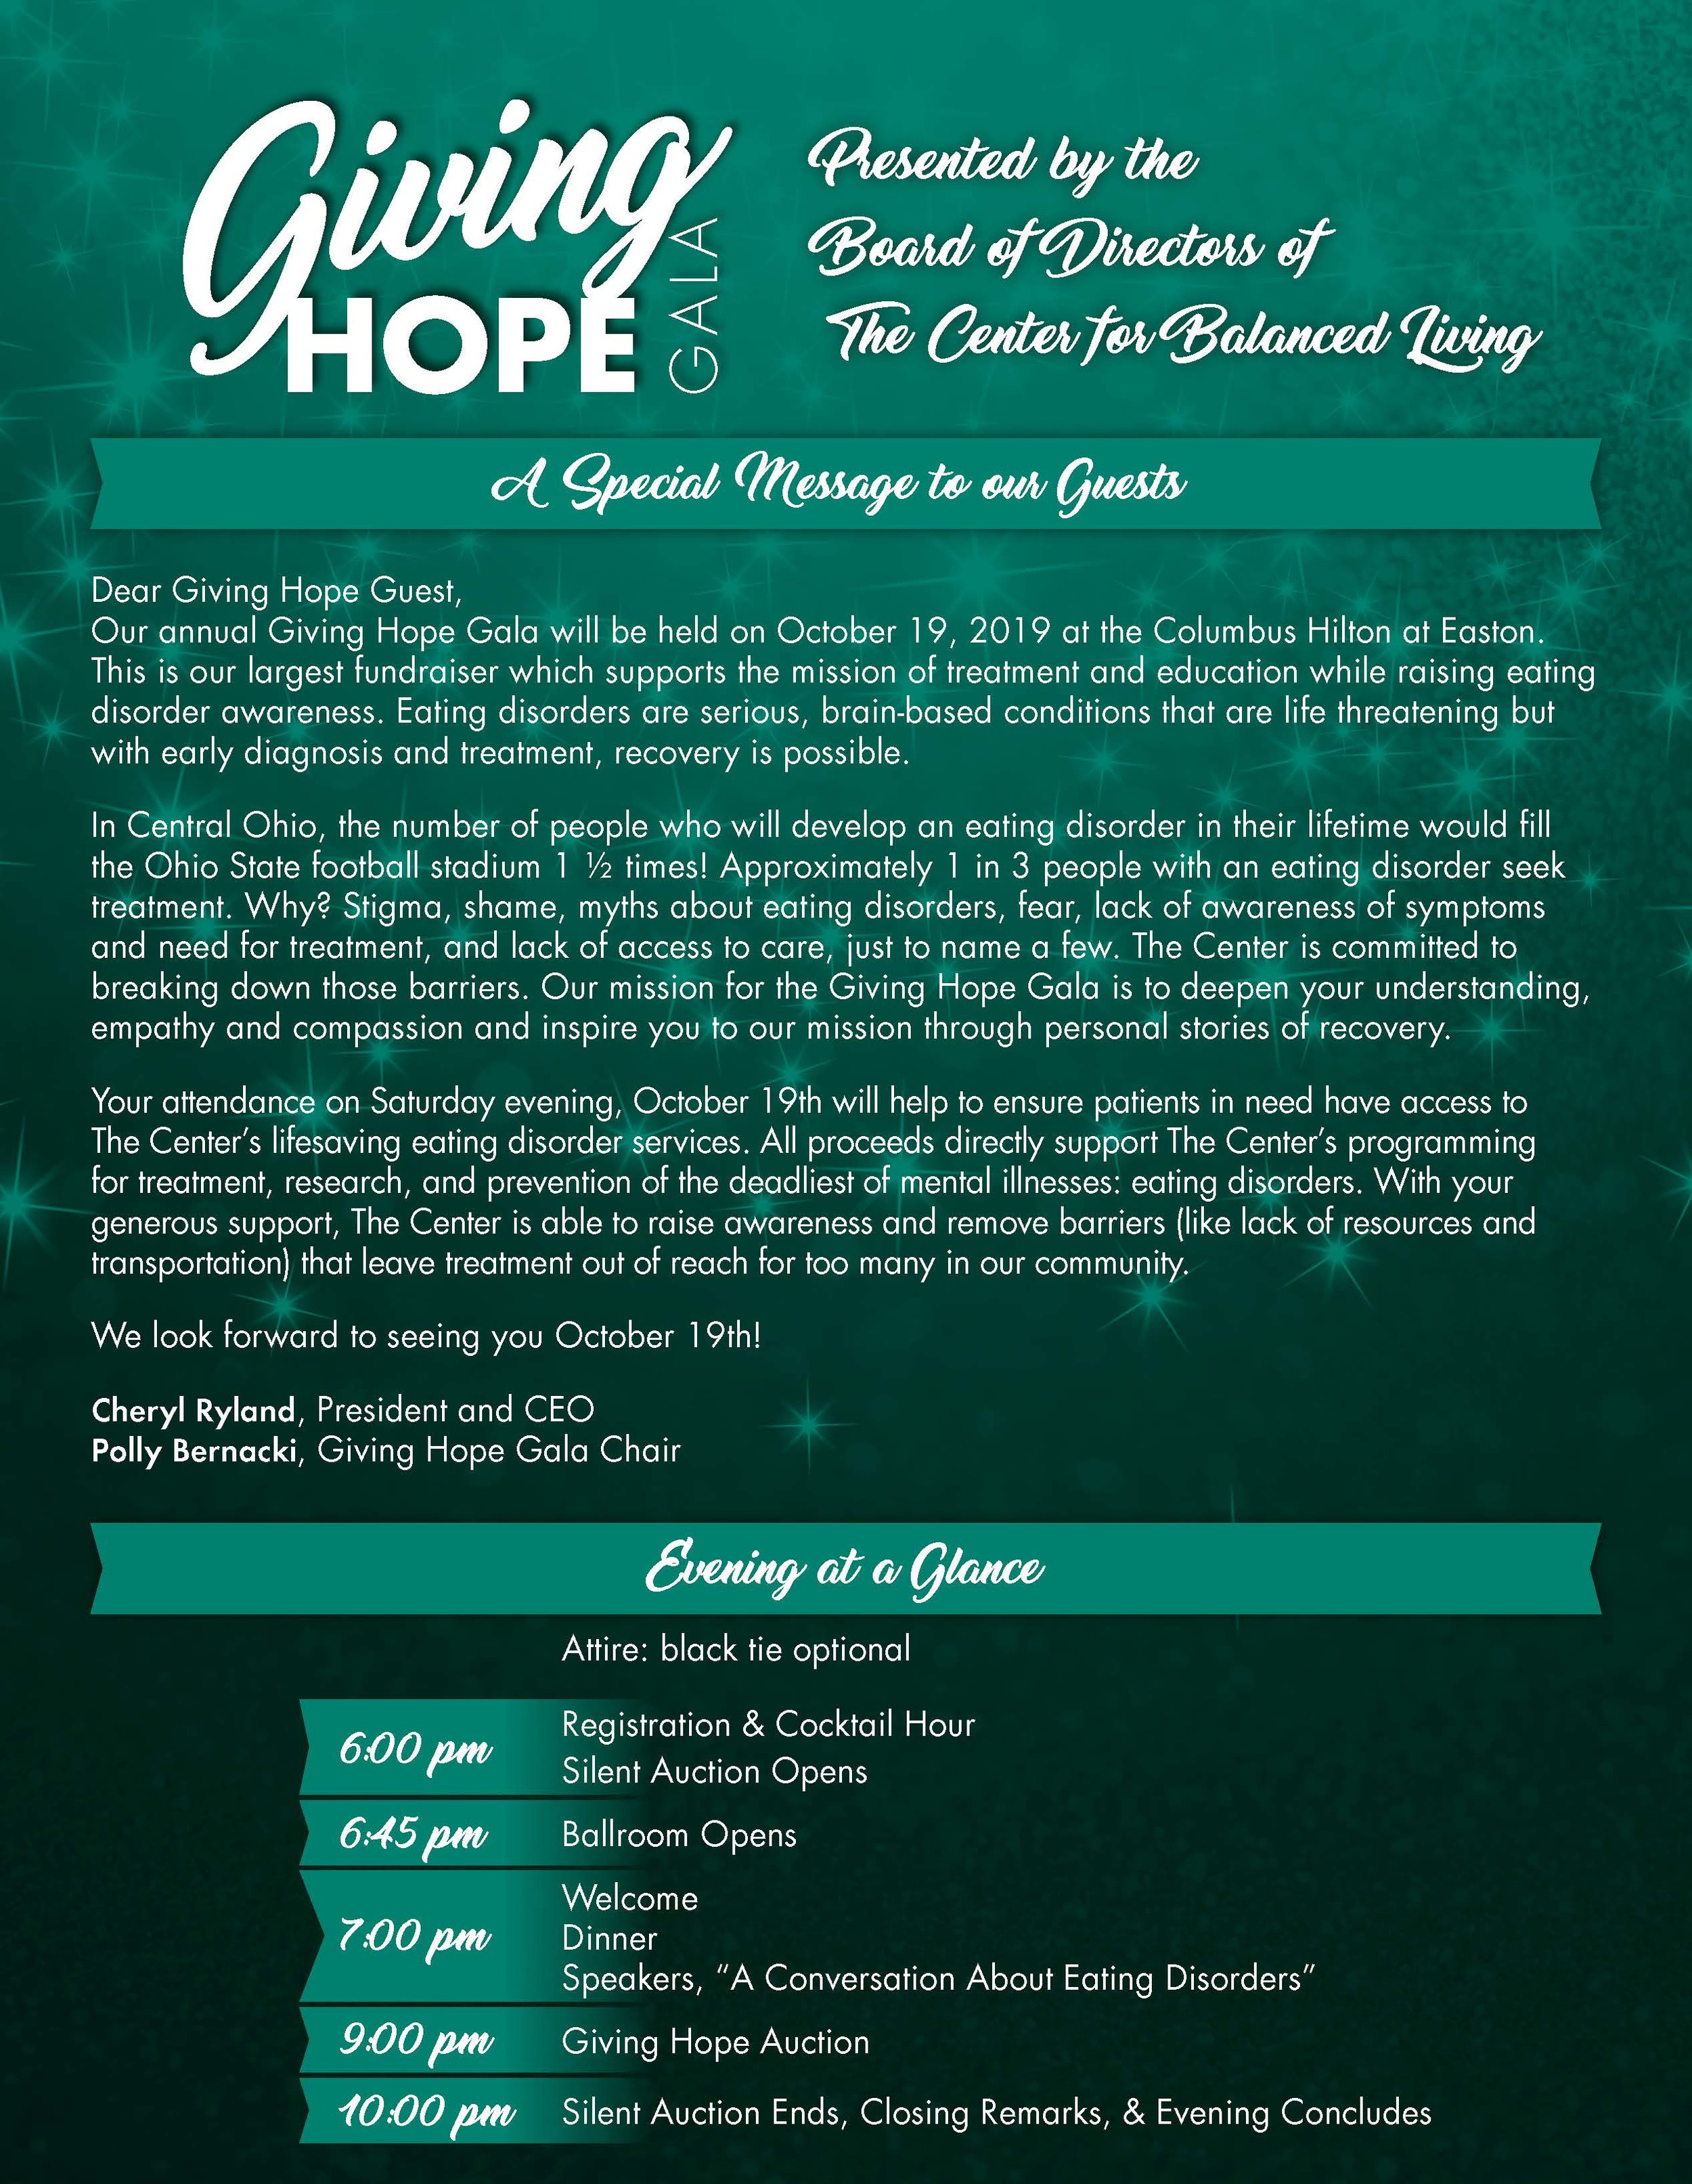 2019 Giving Hope Gala Invitation_Page_3.jpg